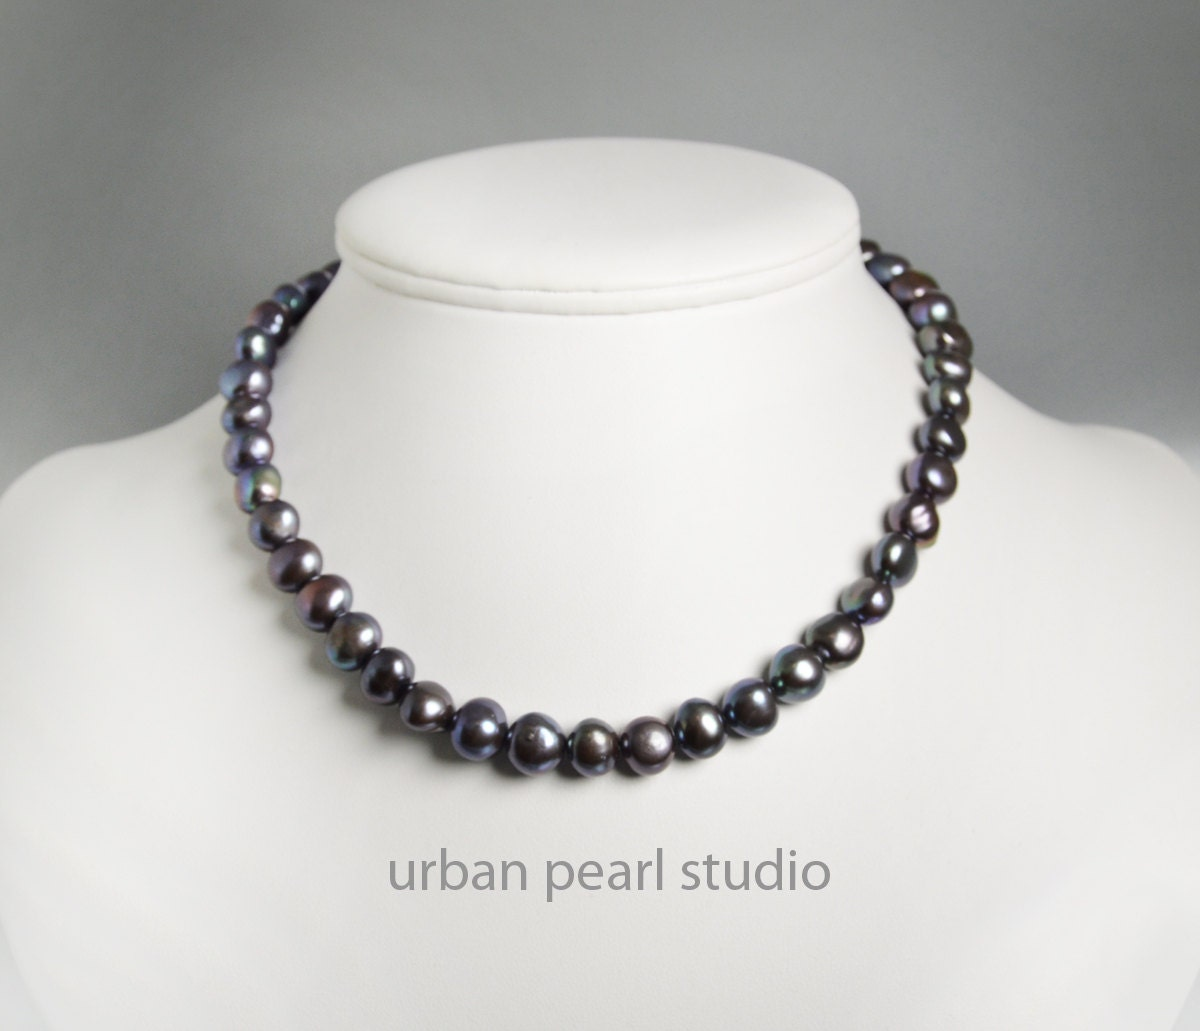 black pearl necklace pearl choker necklace freshwater. Black Bedroom Furniture Sets. Home Design Ideas